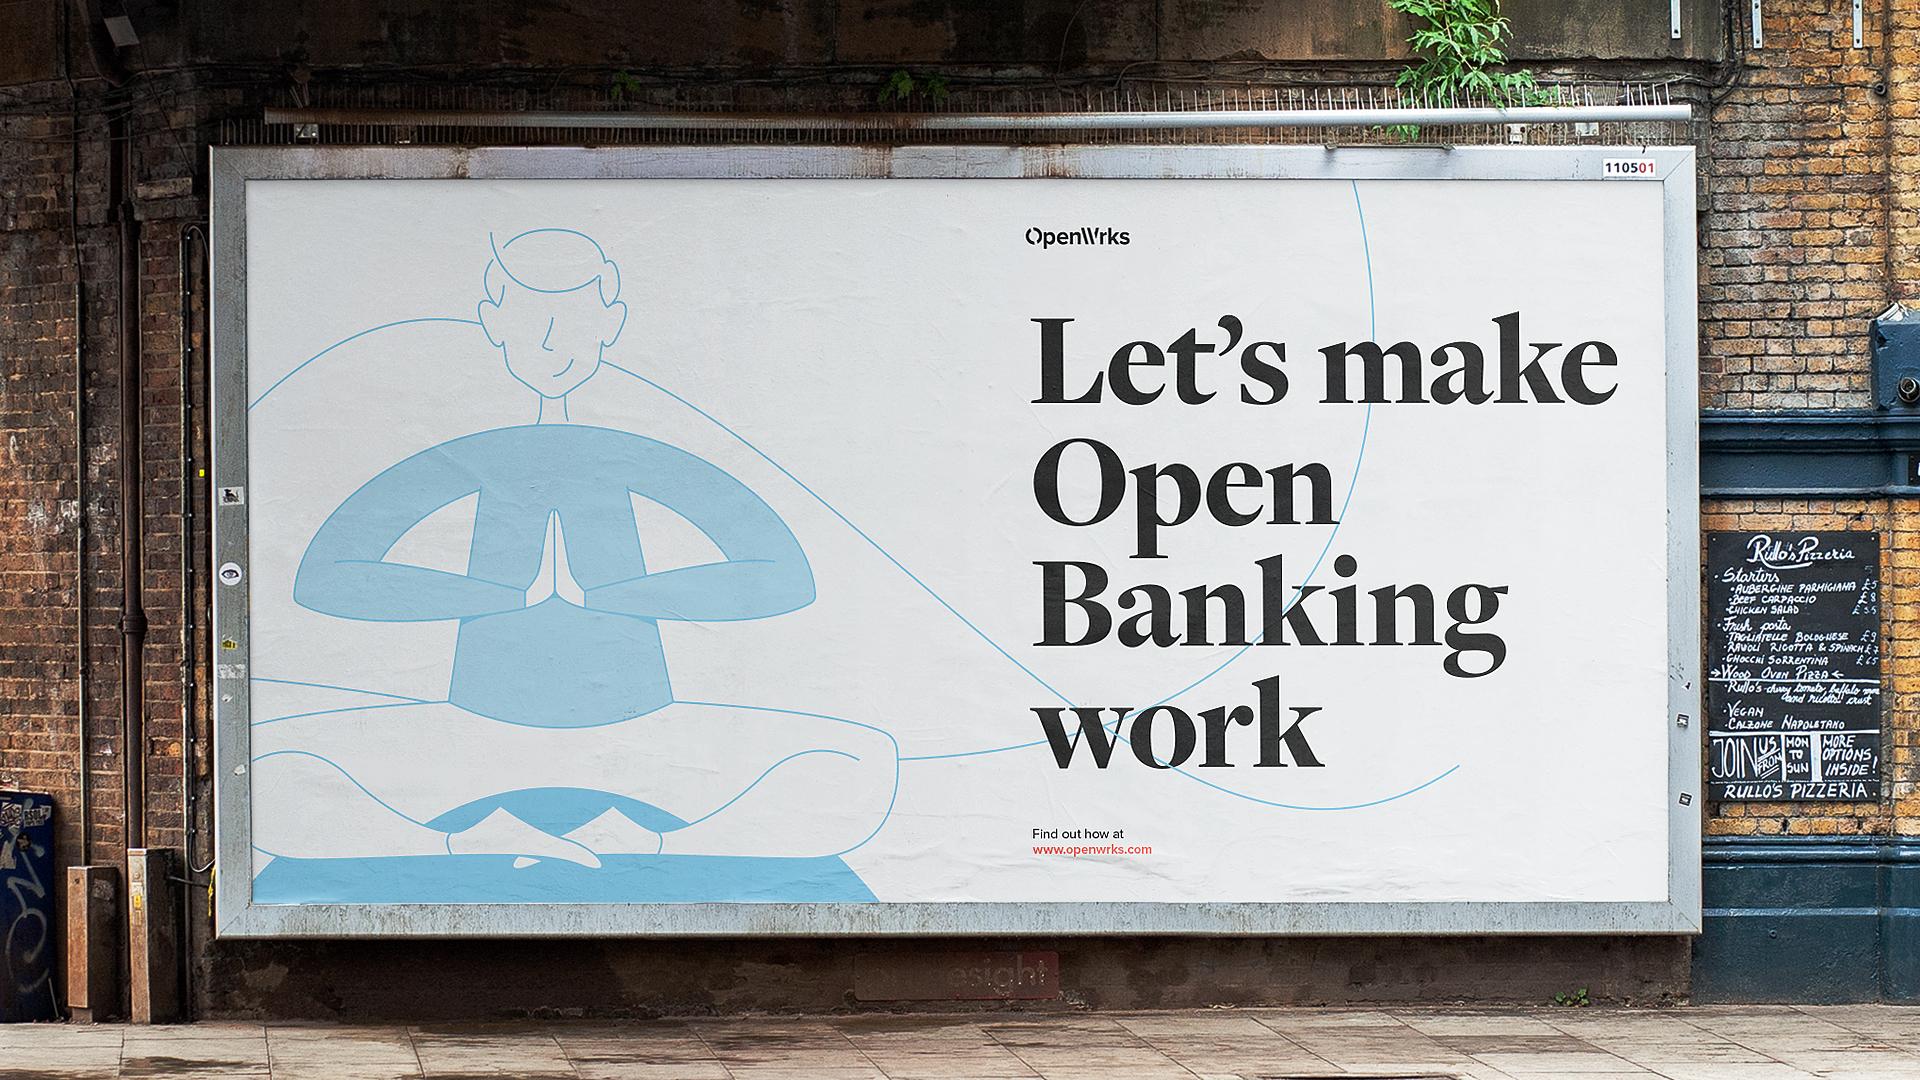 OpenWrks-mckp-4.5.jpg